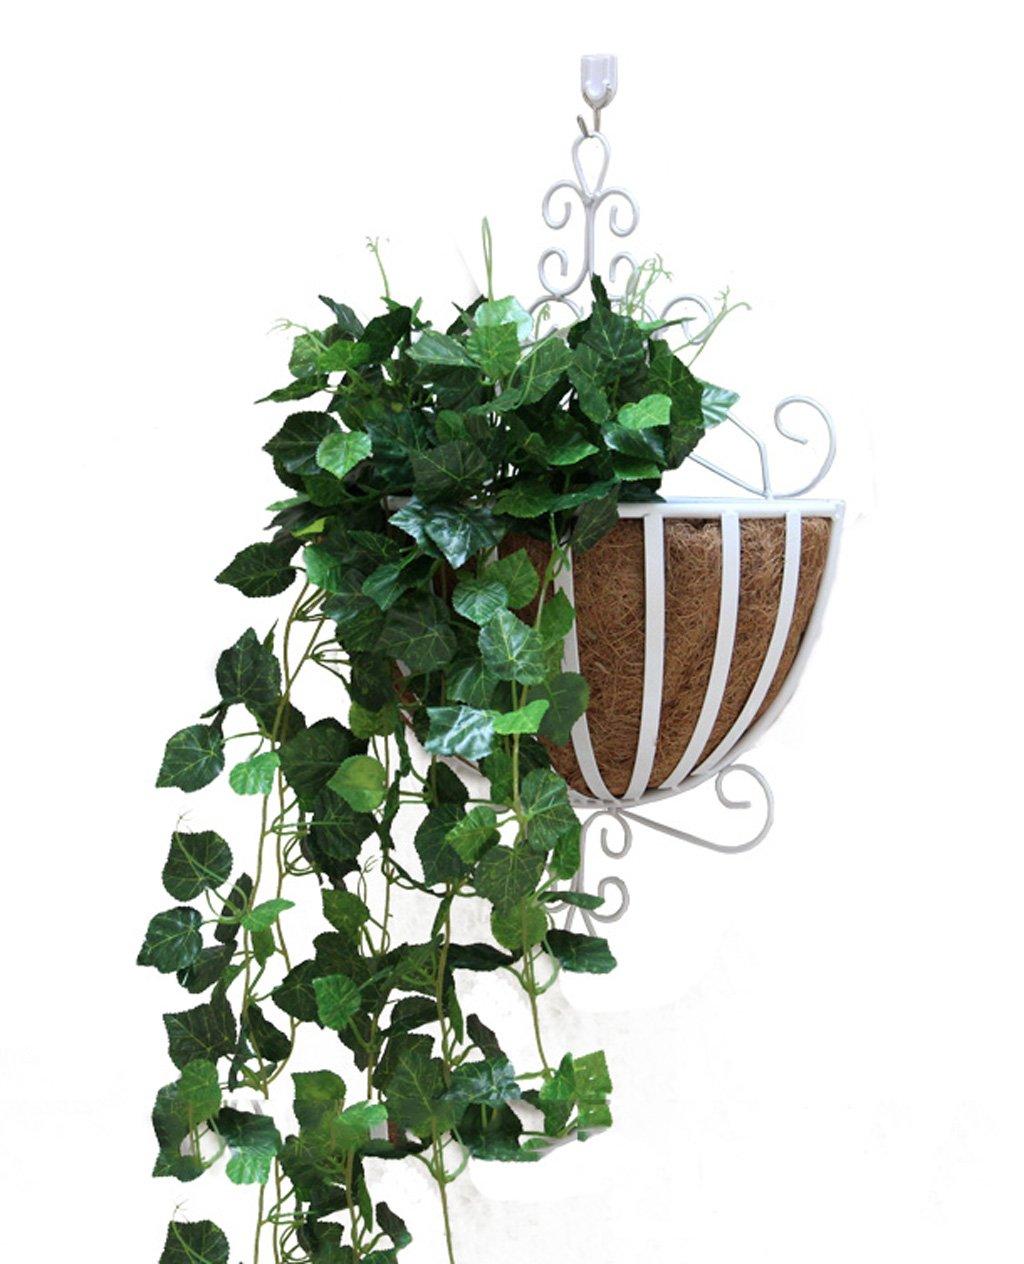 ZENGAI 植物スタンド2個、壁掛けフラワーポットラック吊り屋内バルコニーアイアンフラワーフレームは、盆栽フレームの壁に吊るす フラワースタンド ( 色 : C ) B07B6V38G7 C C